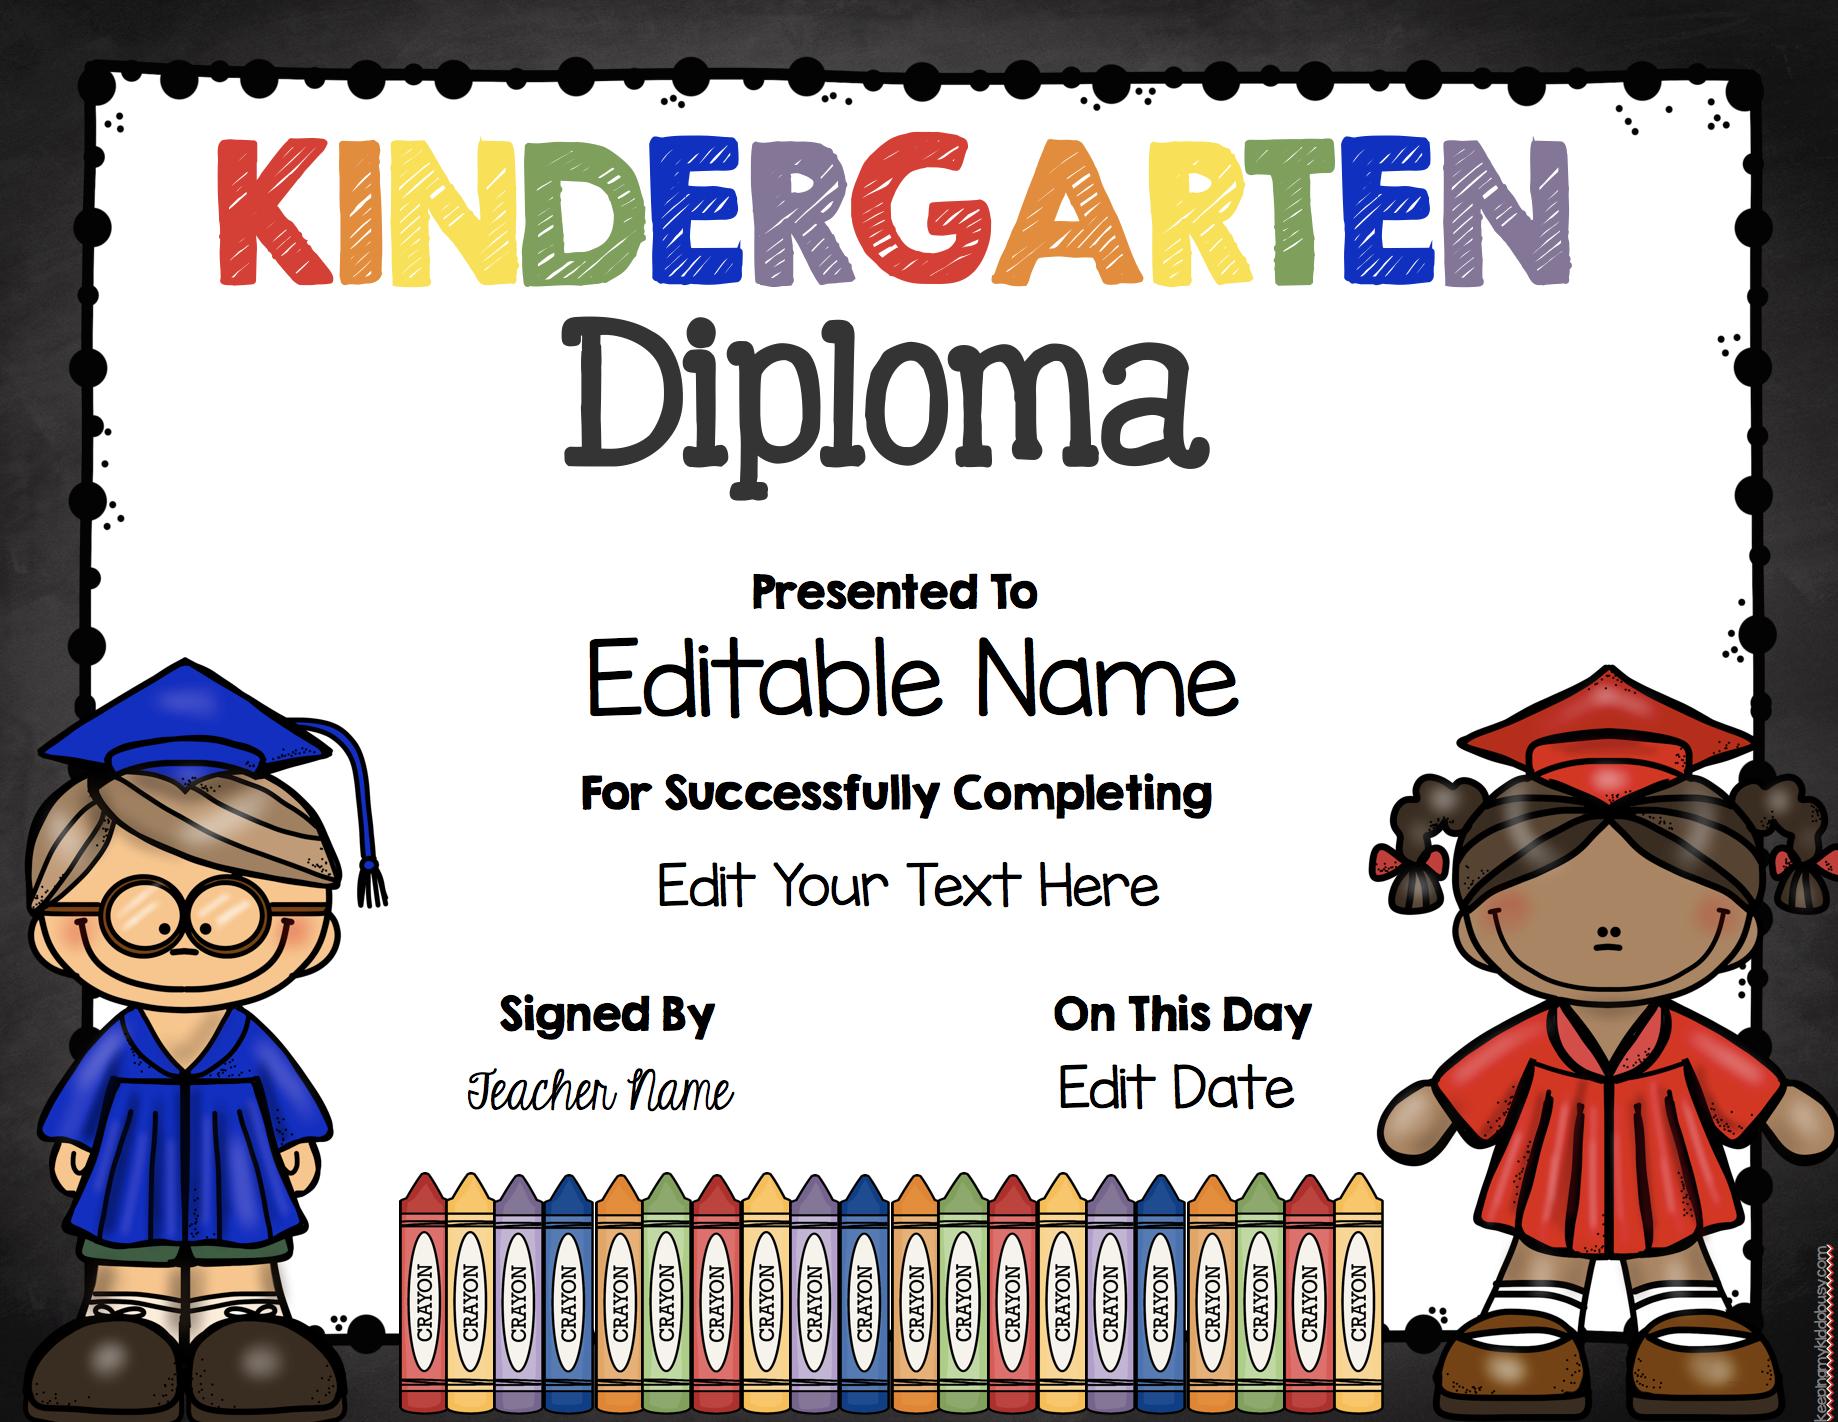 Graduation Class Rings Free Printable Keeping My Kiddo Busy Preschool Diploma Kindergarten Diploma Kindergarten Graduation Ceremony [ 1422 x 1838 Pixel ]